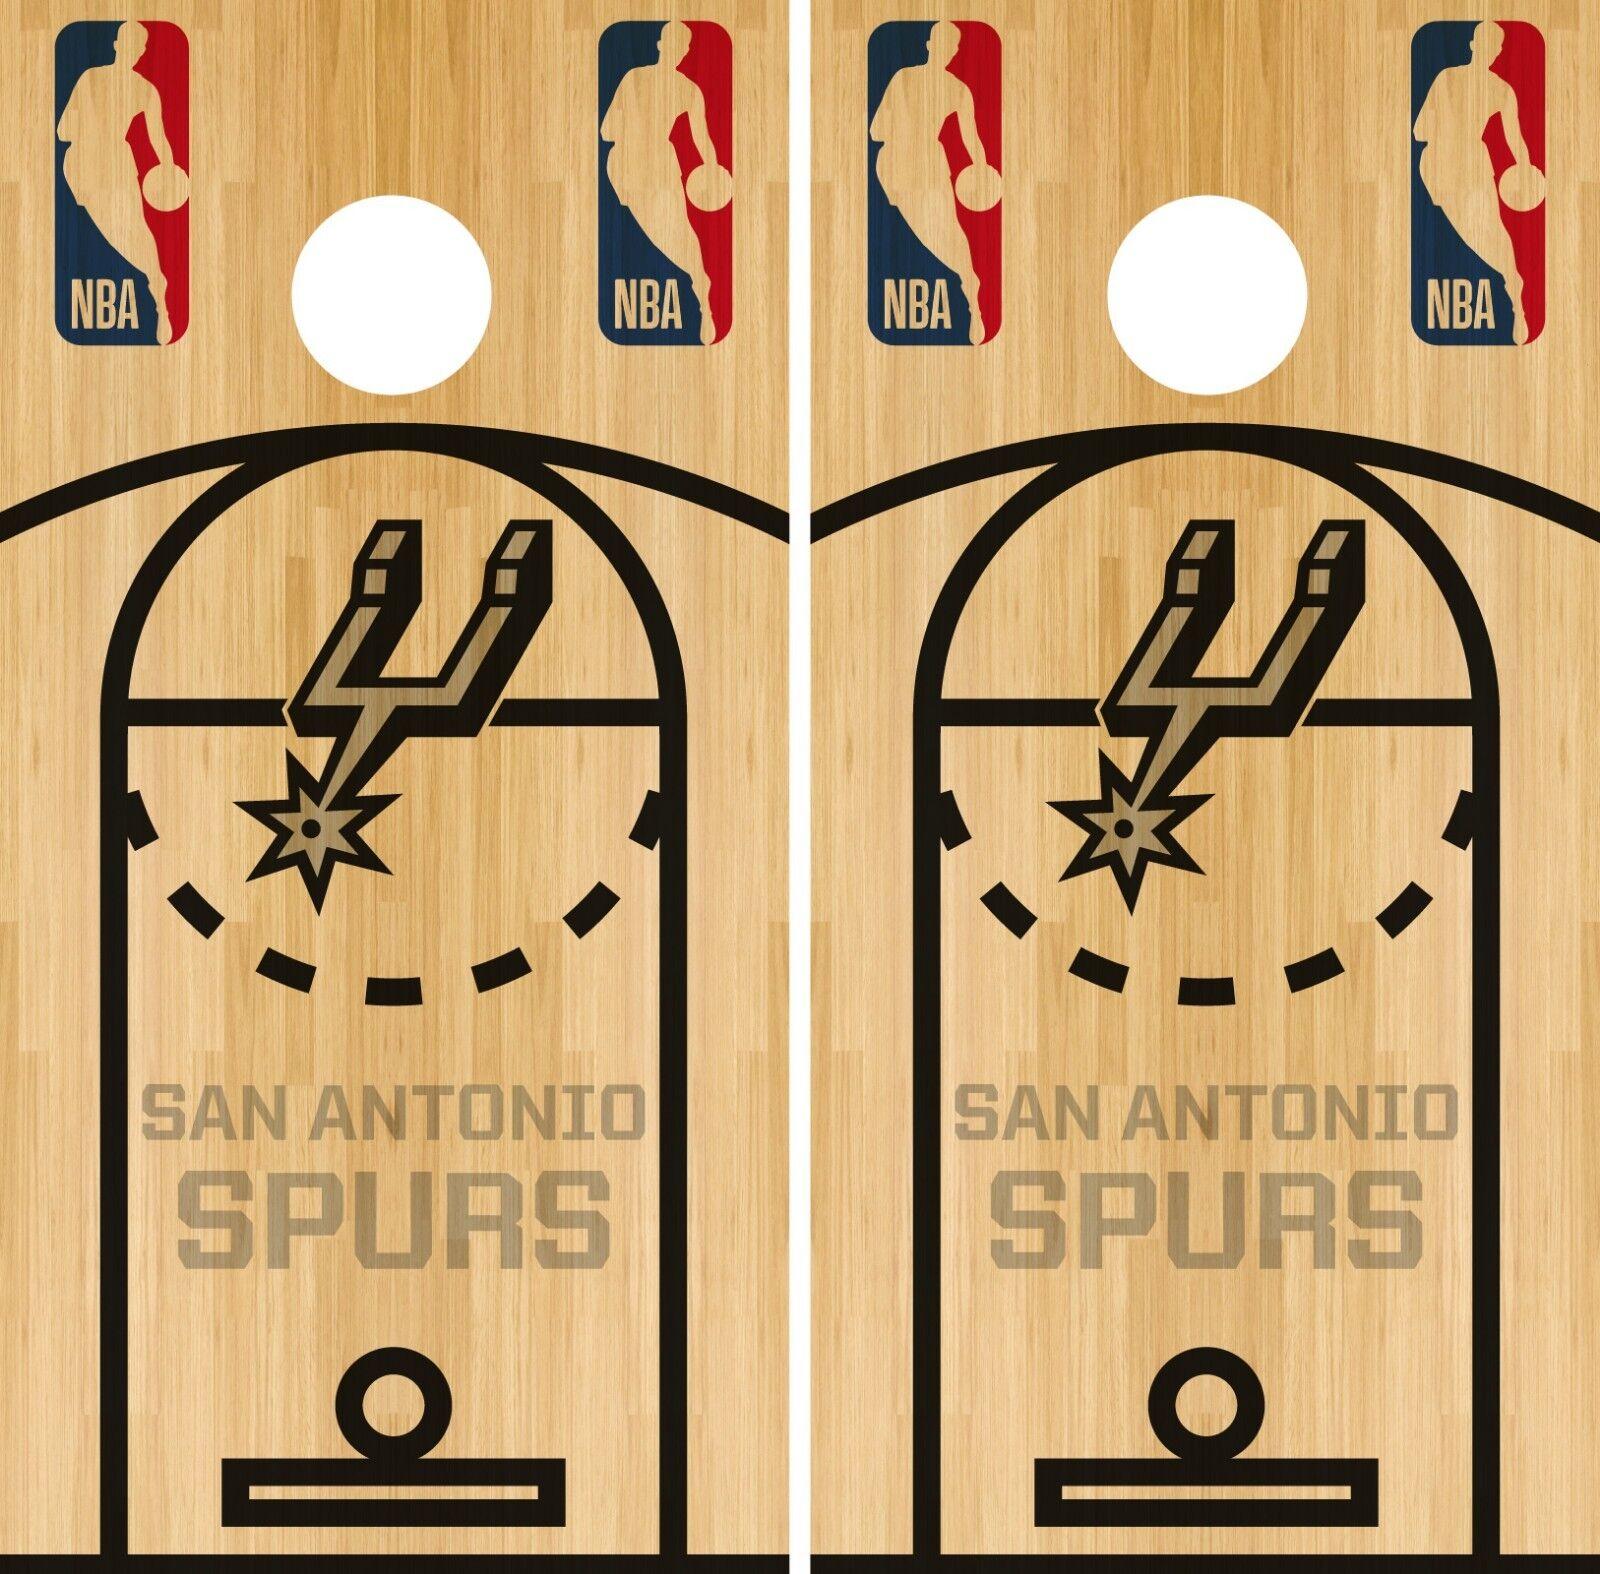 San Antonio Spurs Cornhole Wrap NBA Game  Skin Board Vinyl Decal Court Set CO710  convenient